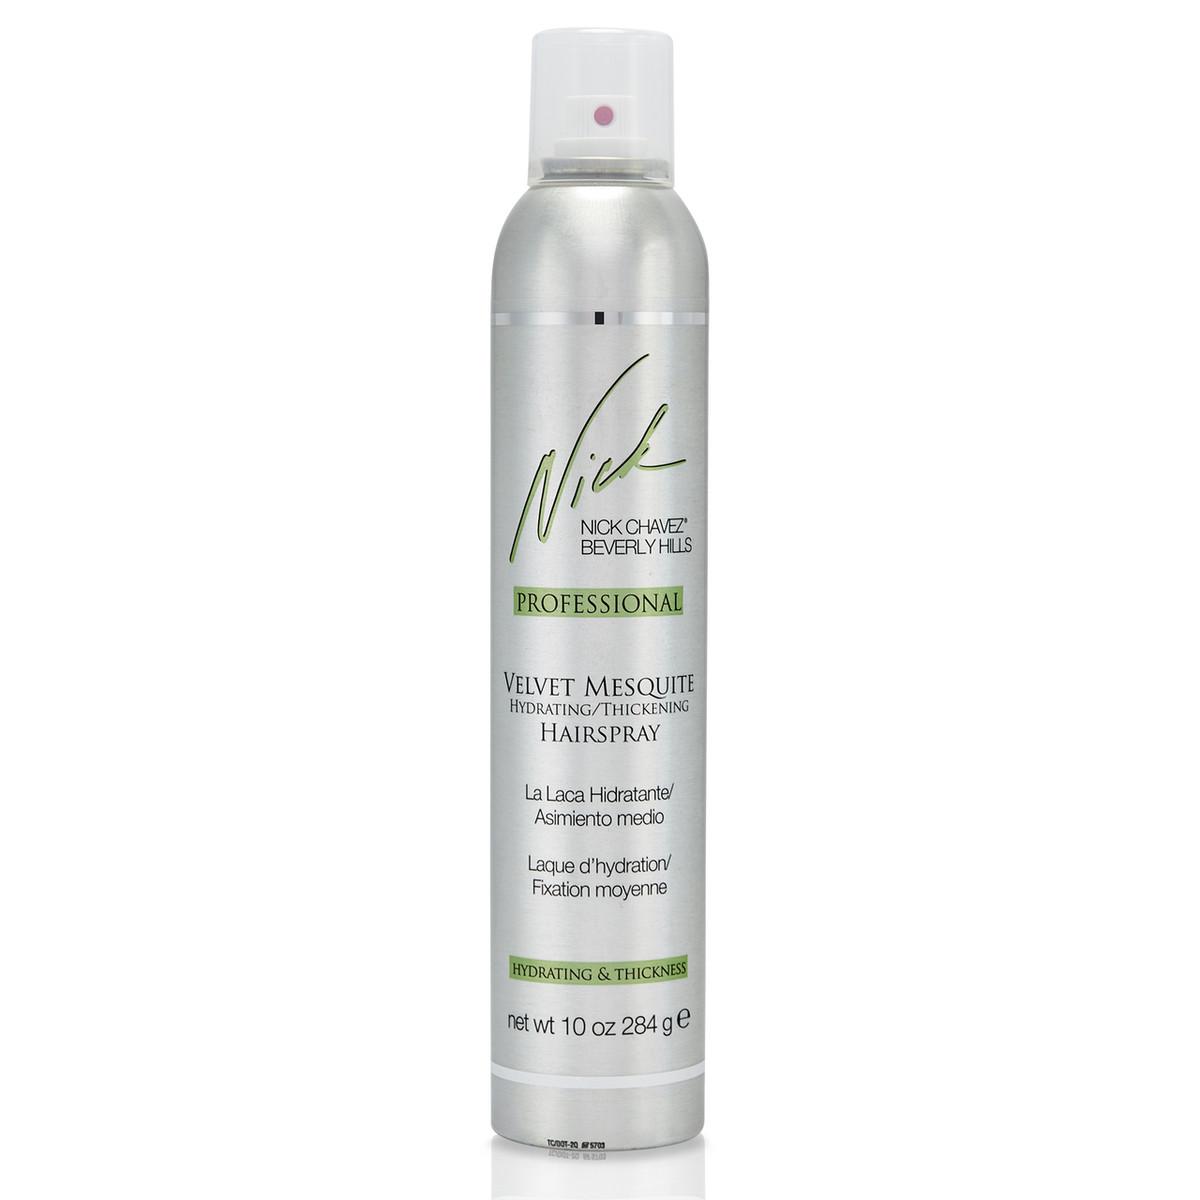 Velvet Mesquite Thickening Hydrating Hairspray (10 oz)